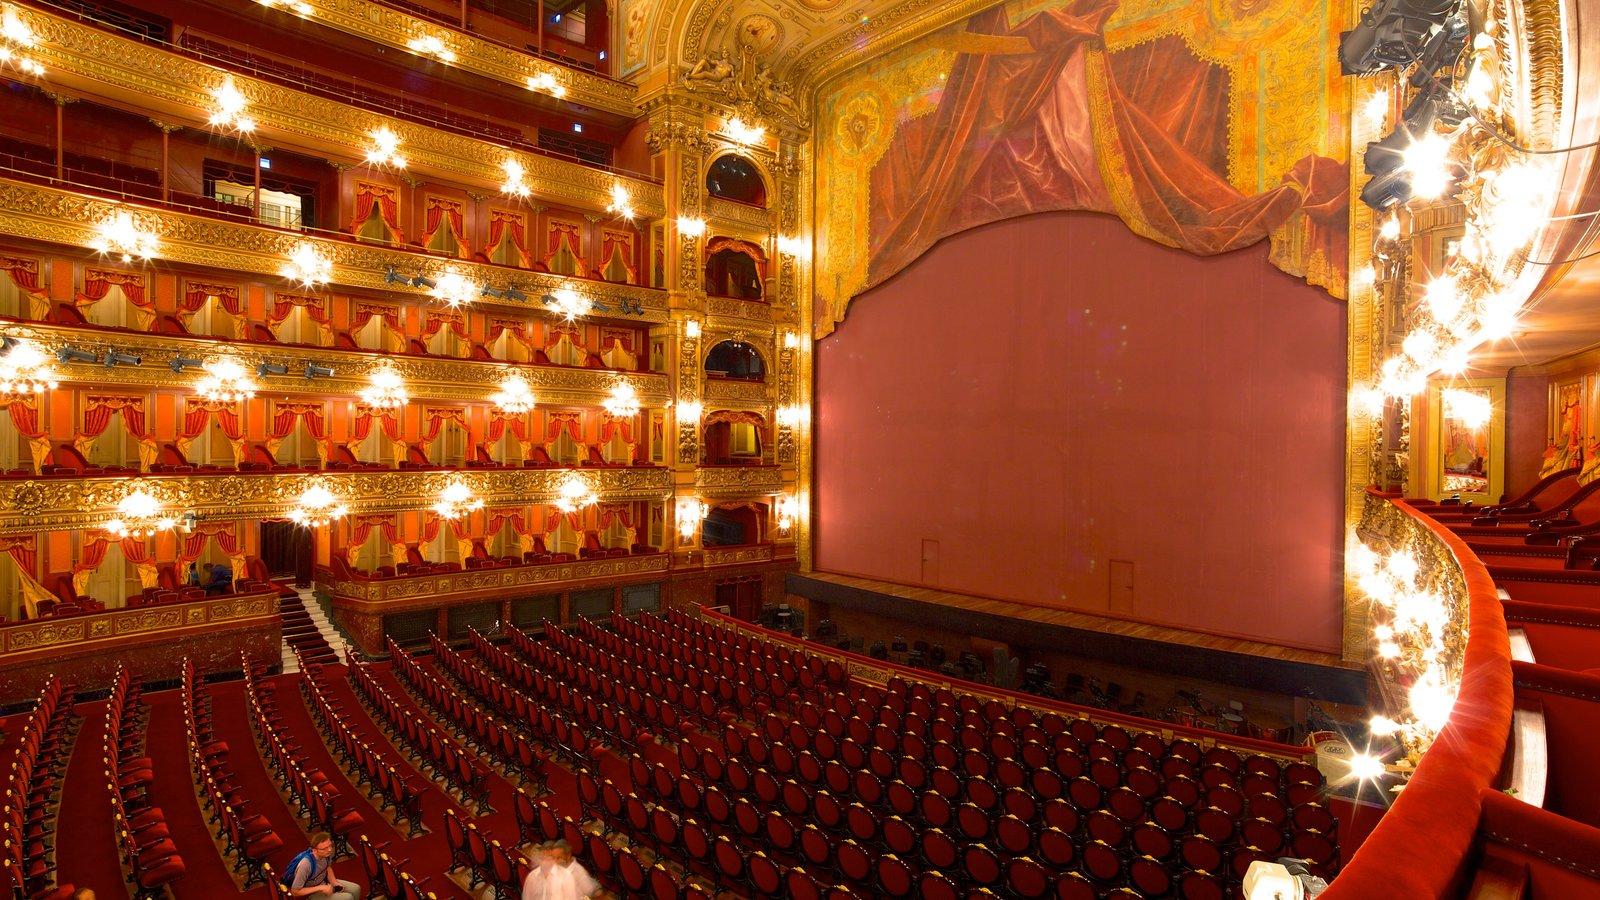 Teatro Colón que inclui arquitetura de patrimônio, cenas de teatro e vistas internas